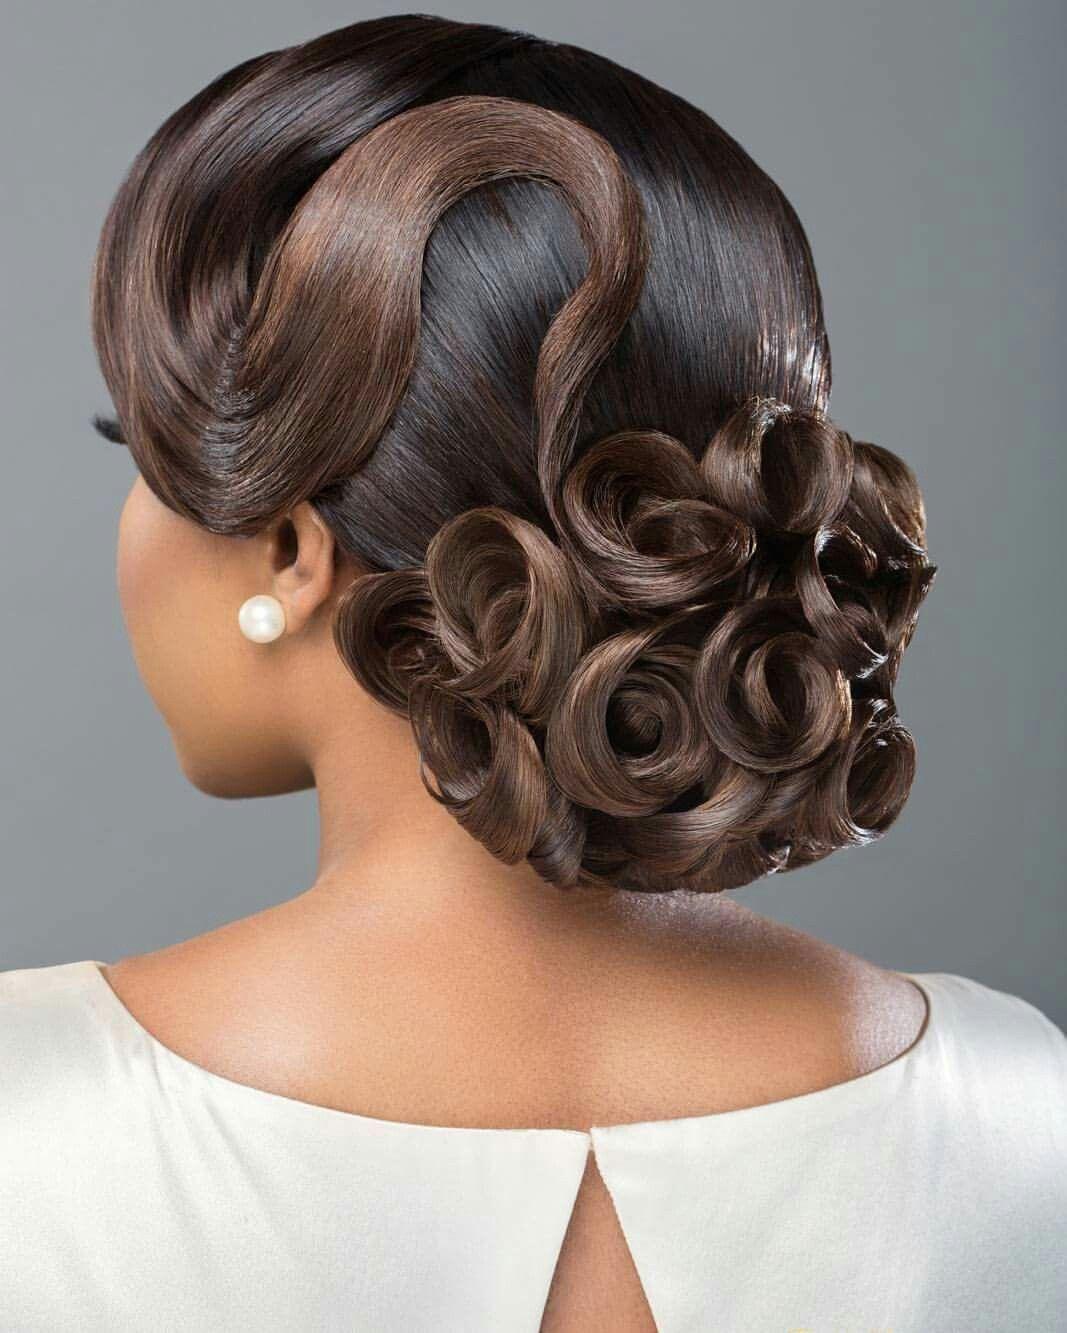 pin by sharron on wedding hair styles in 2019 | wedding